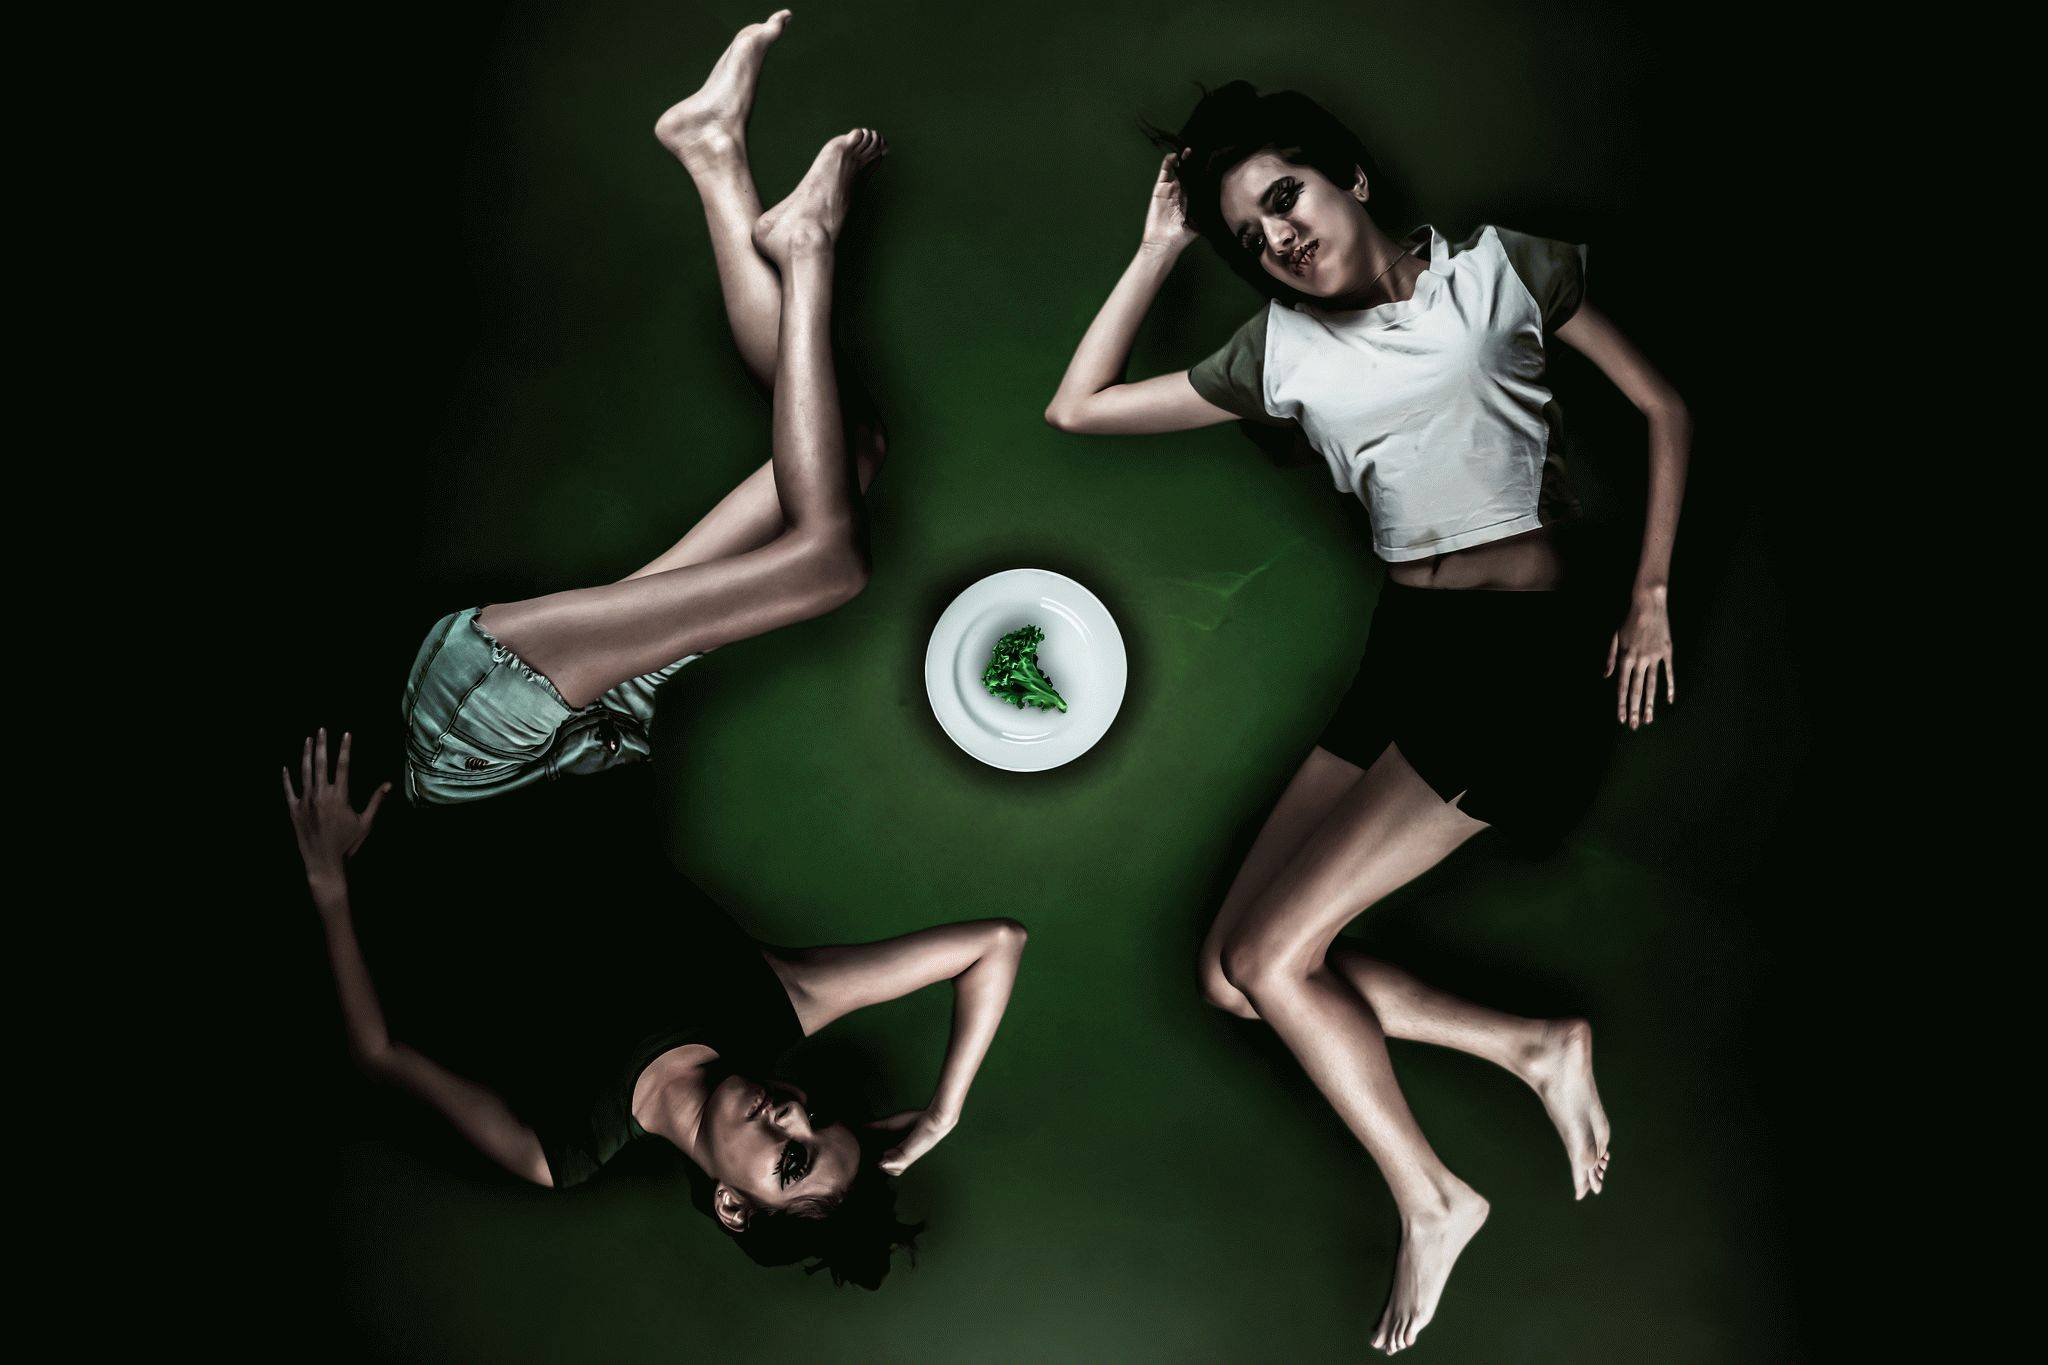 Лечение анорексии: методы, лечебное питание | food and health